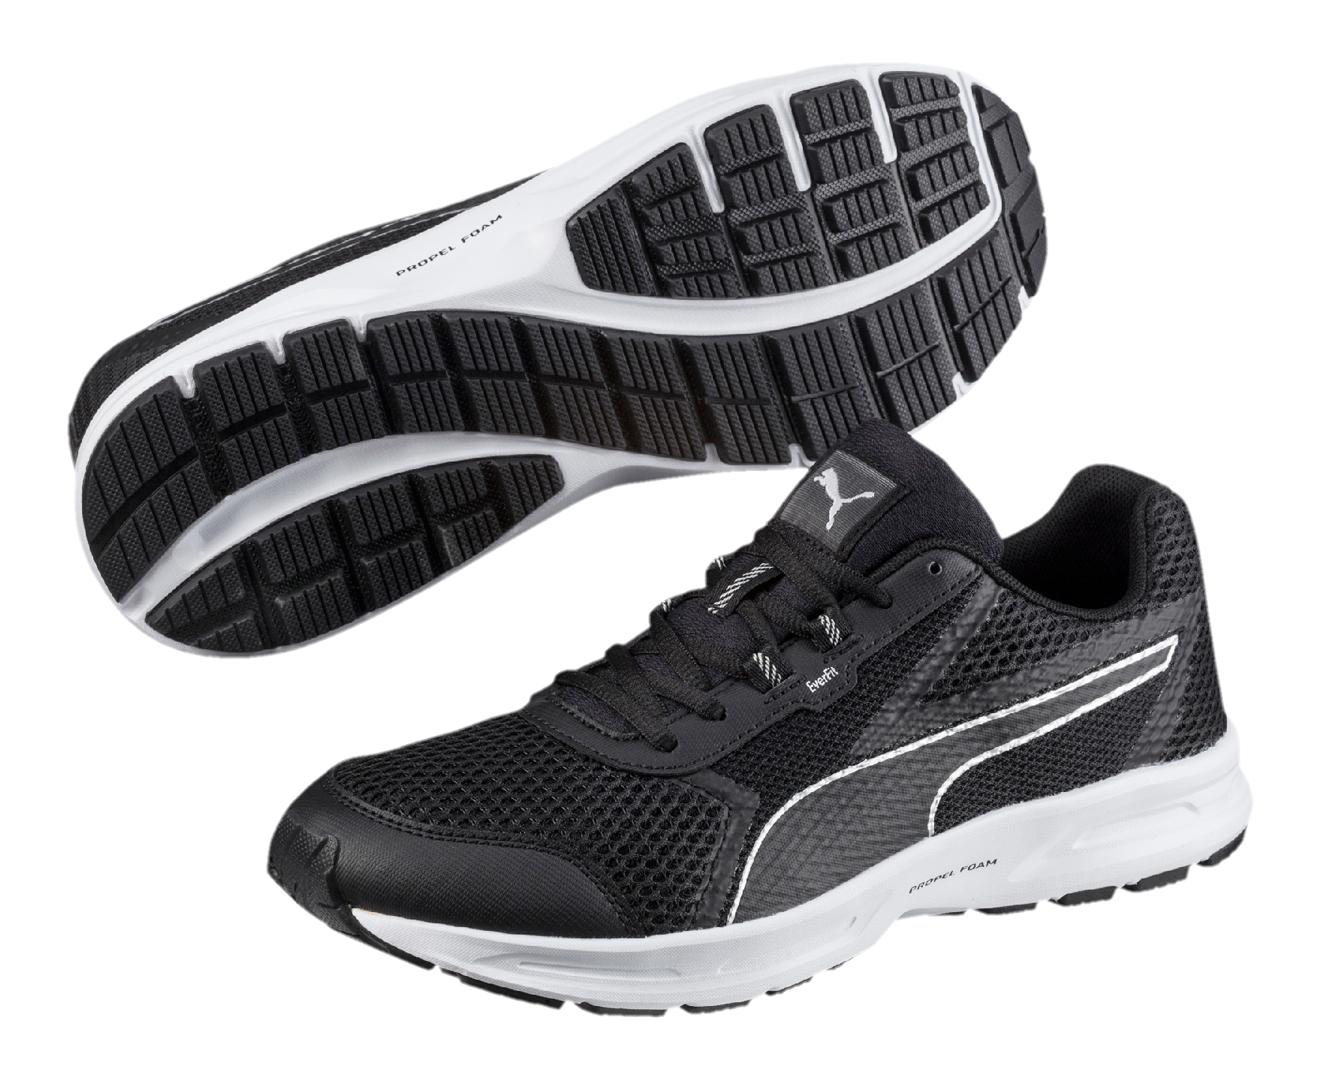 Mens Essential Runner Multisport Outdoor Shoes, Black/Silver Puma